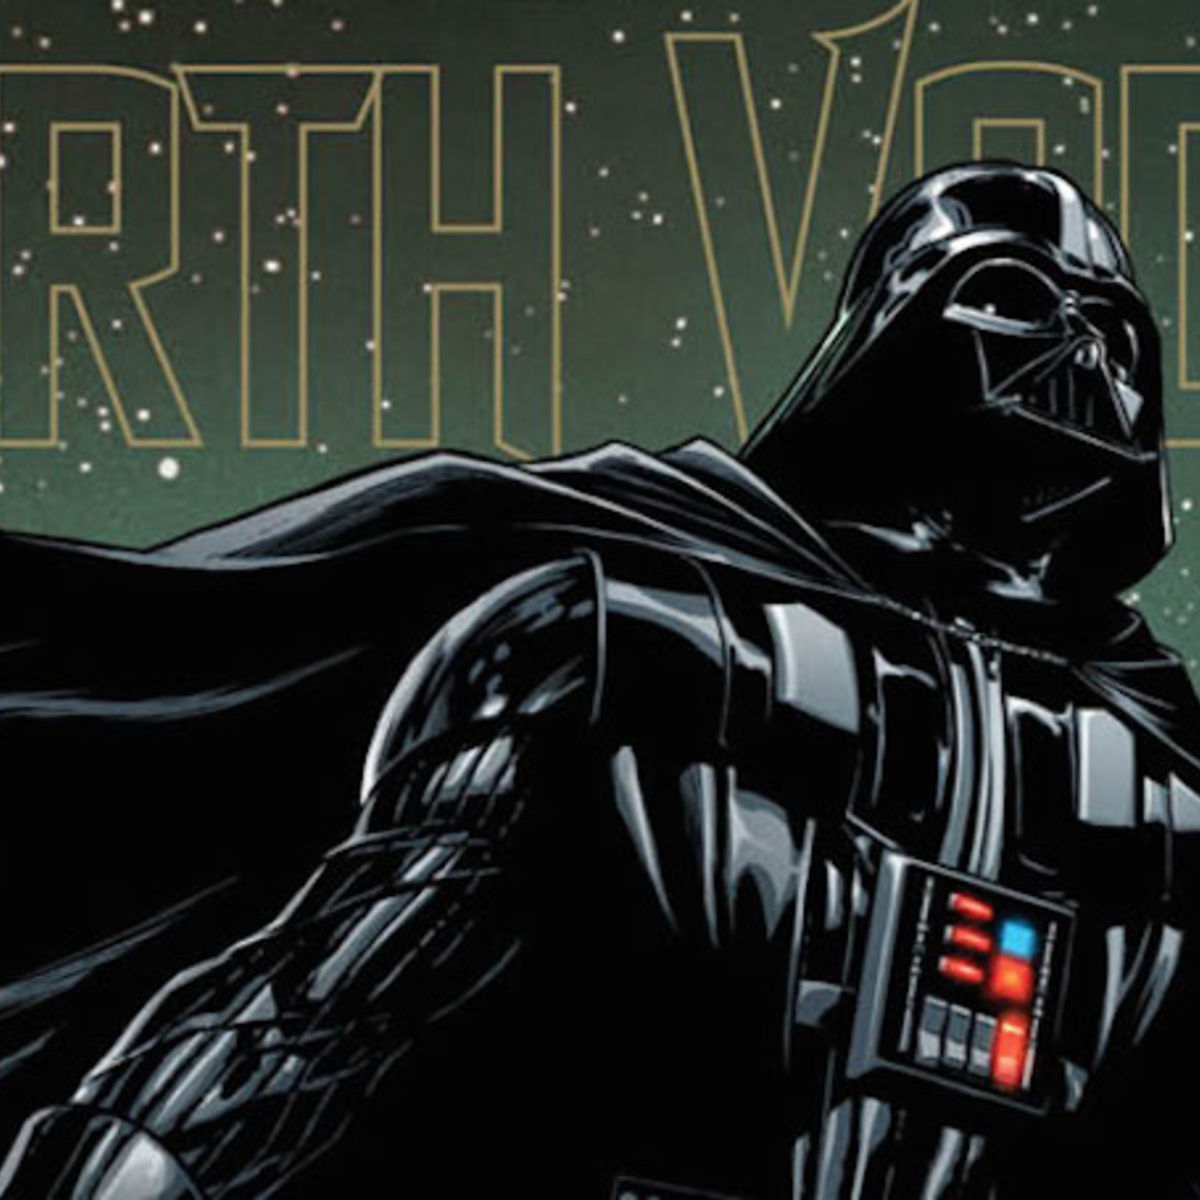 Vader-2defc-1_0.jpg